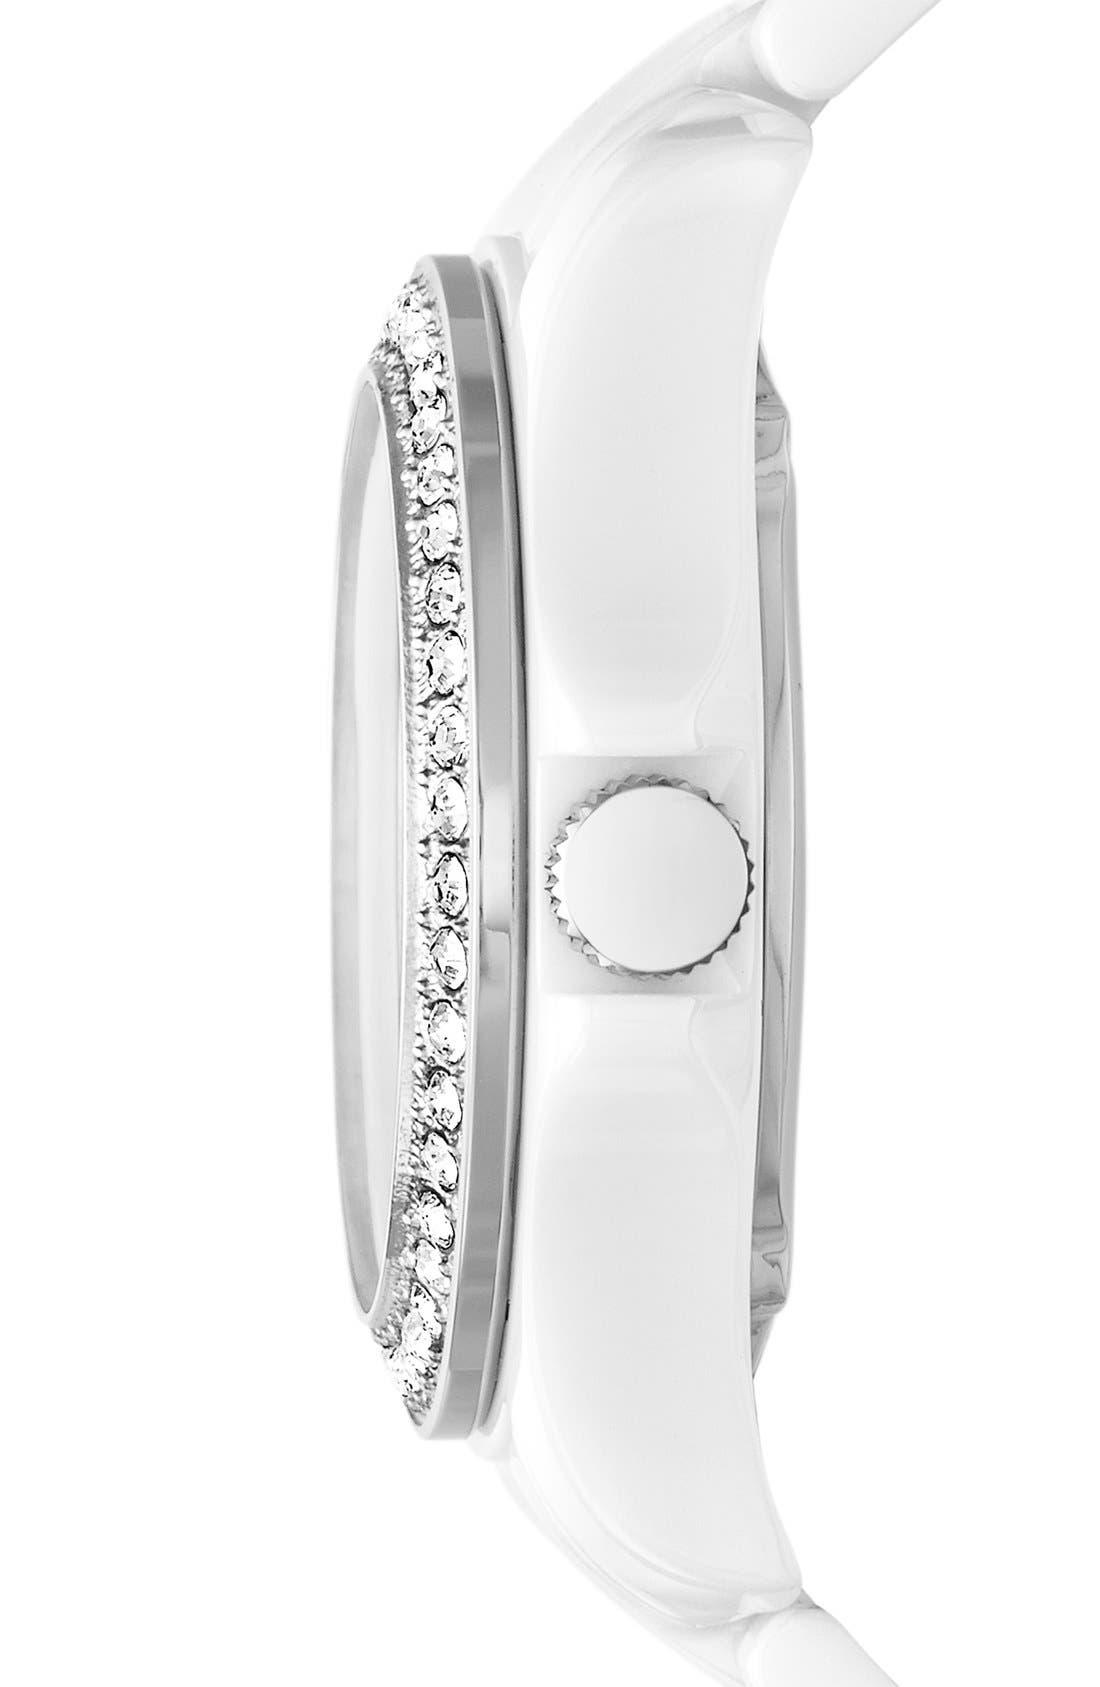 Alternate Image 3  - Fossil 'Riley' Crystal Bezel Ceramic Bracelet Watch, 40mm